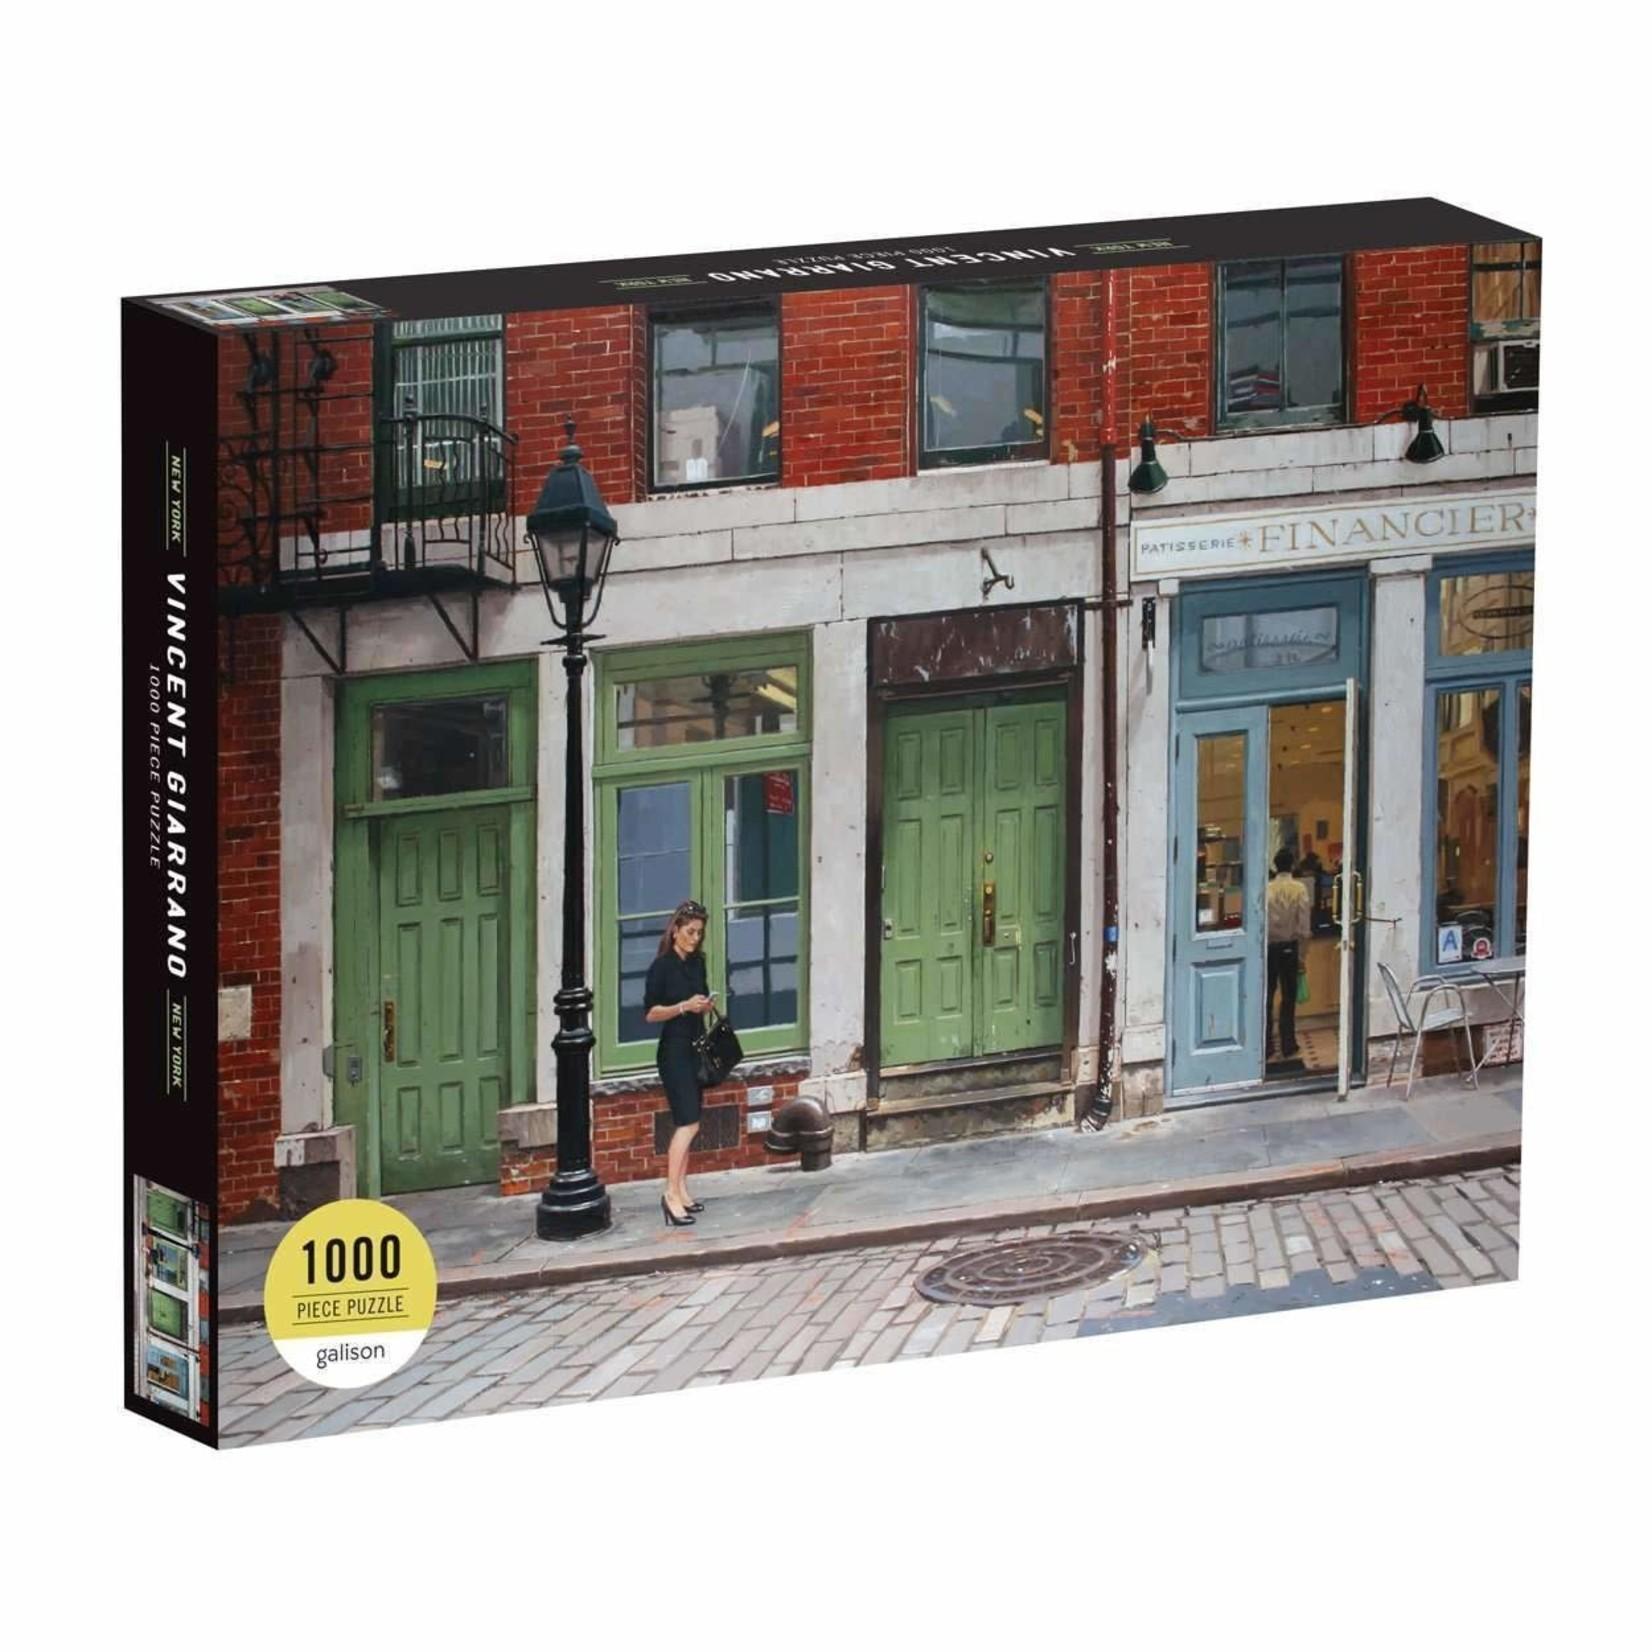 Galison Galison - 1000 Piece Puzzle: Vincent Giaranno - New York